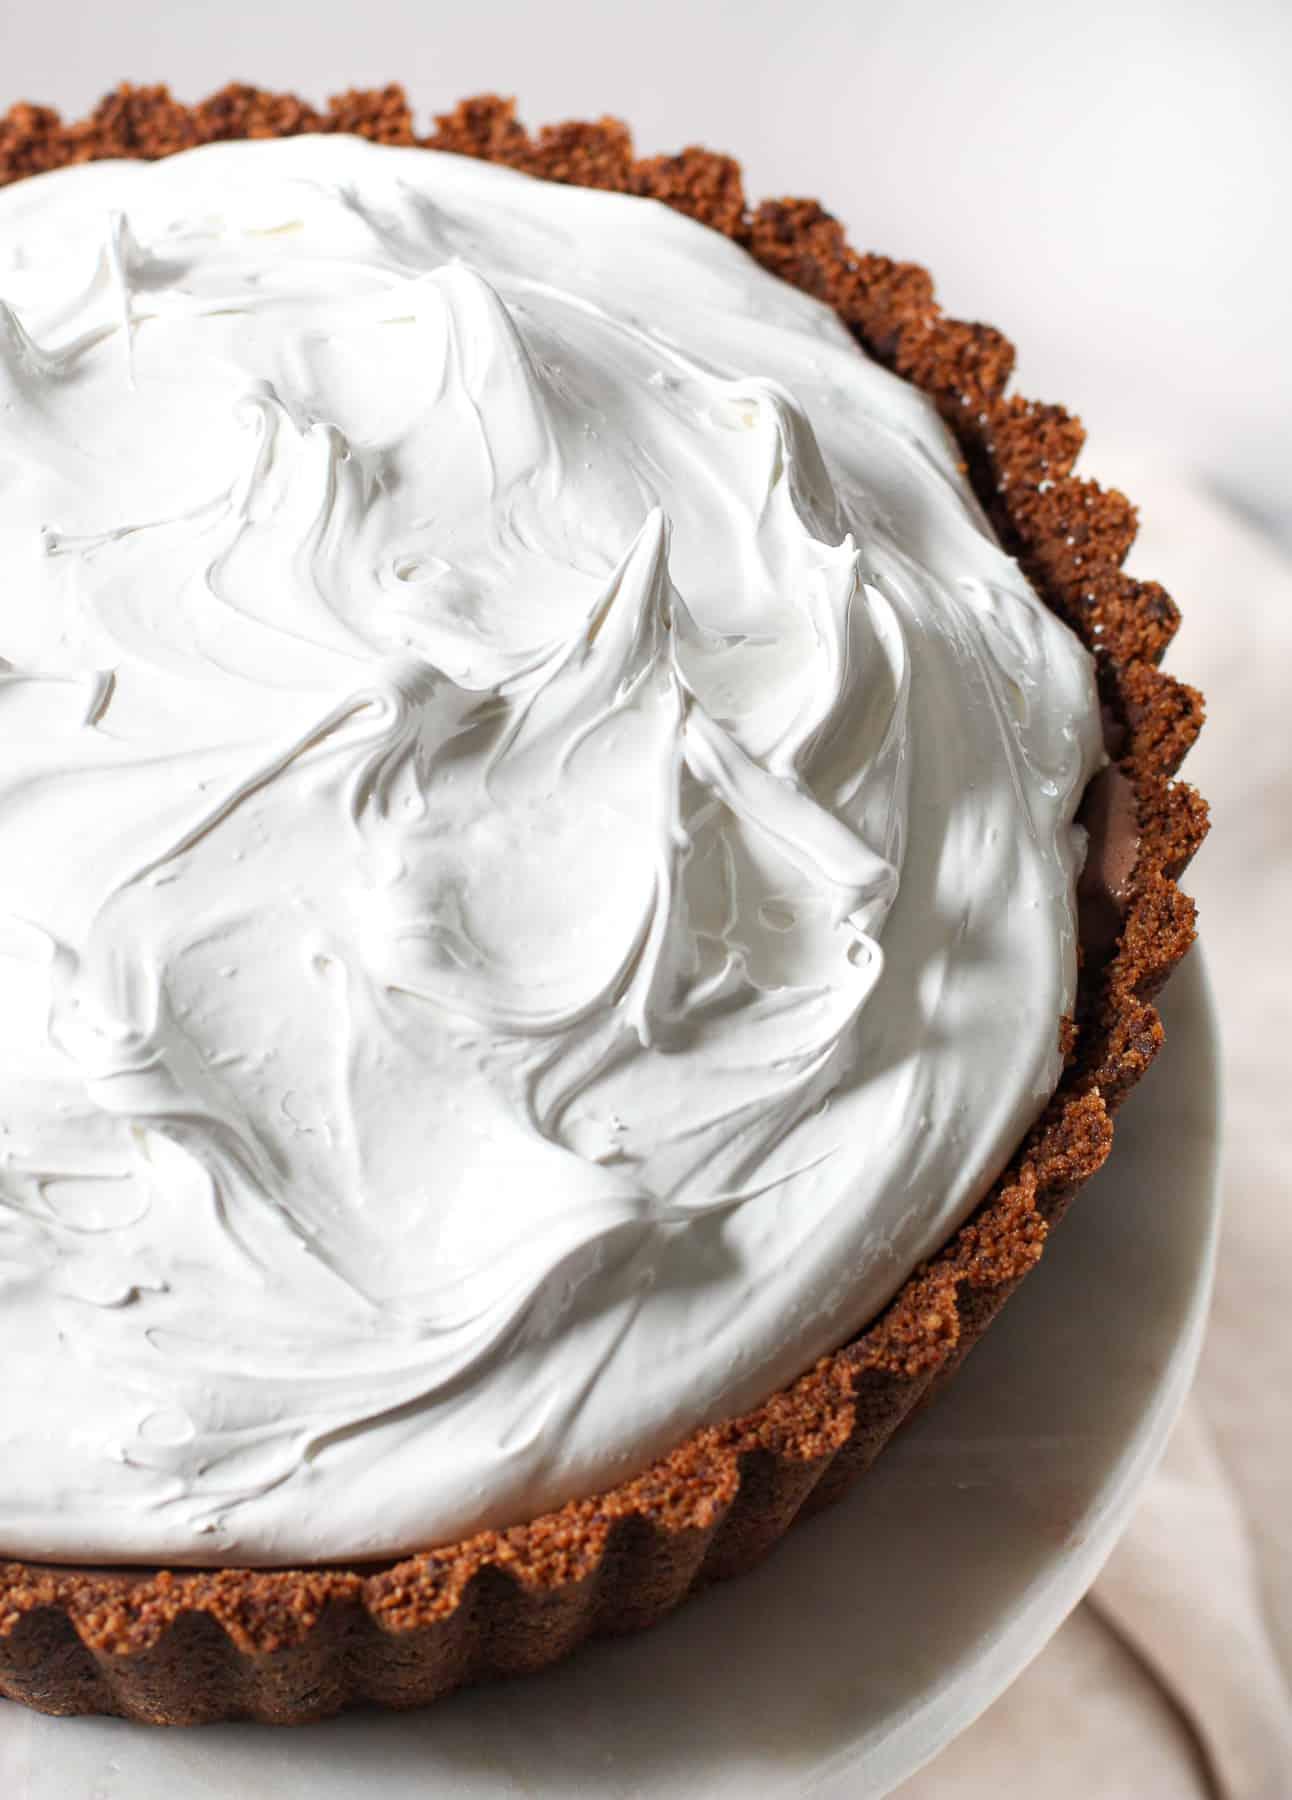 Swiss Meringue on top of a baked Alaska Pie